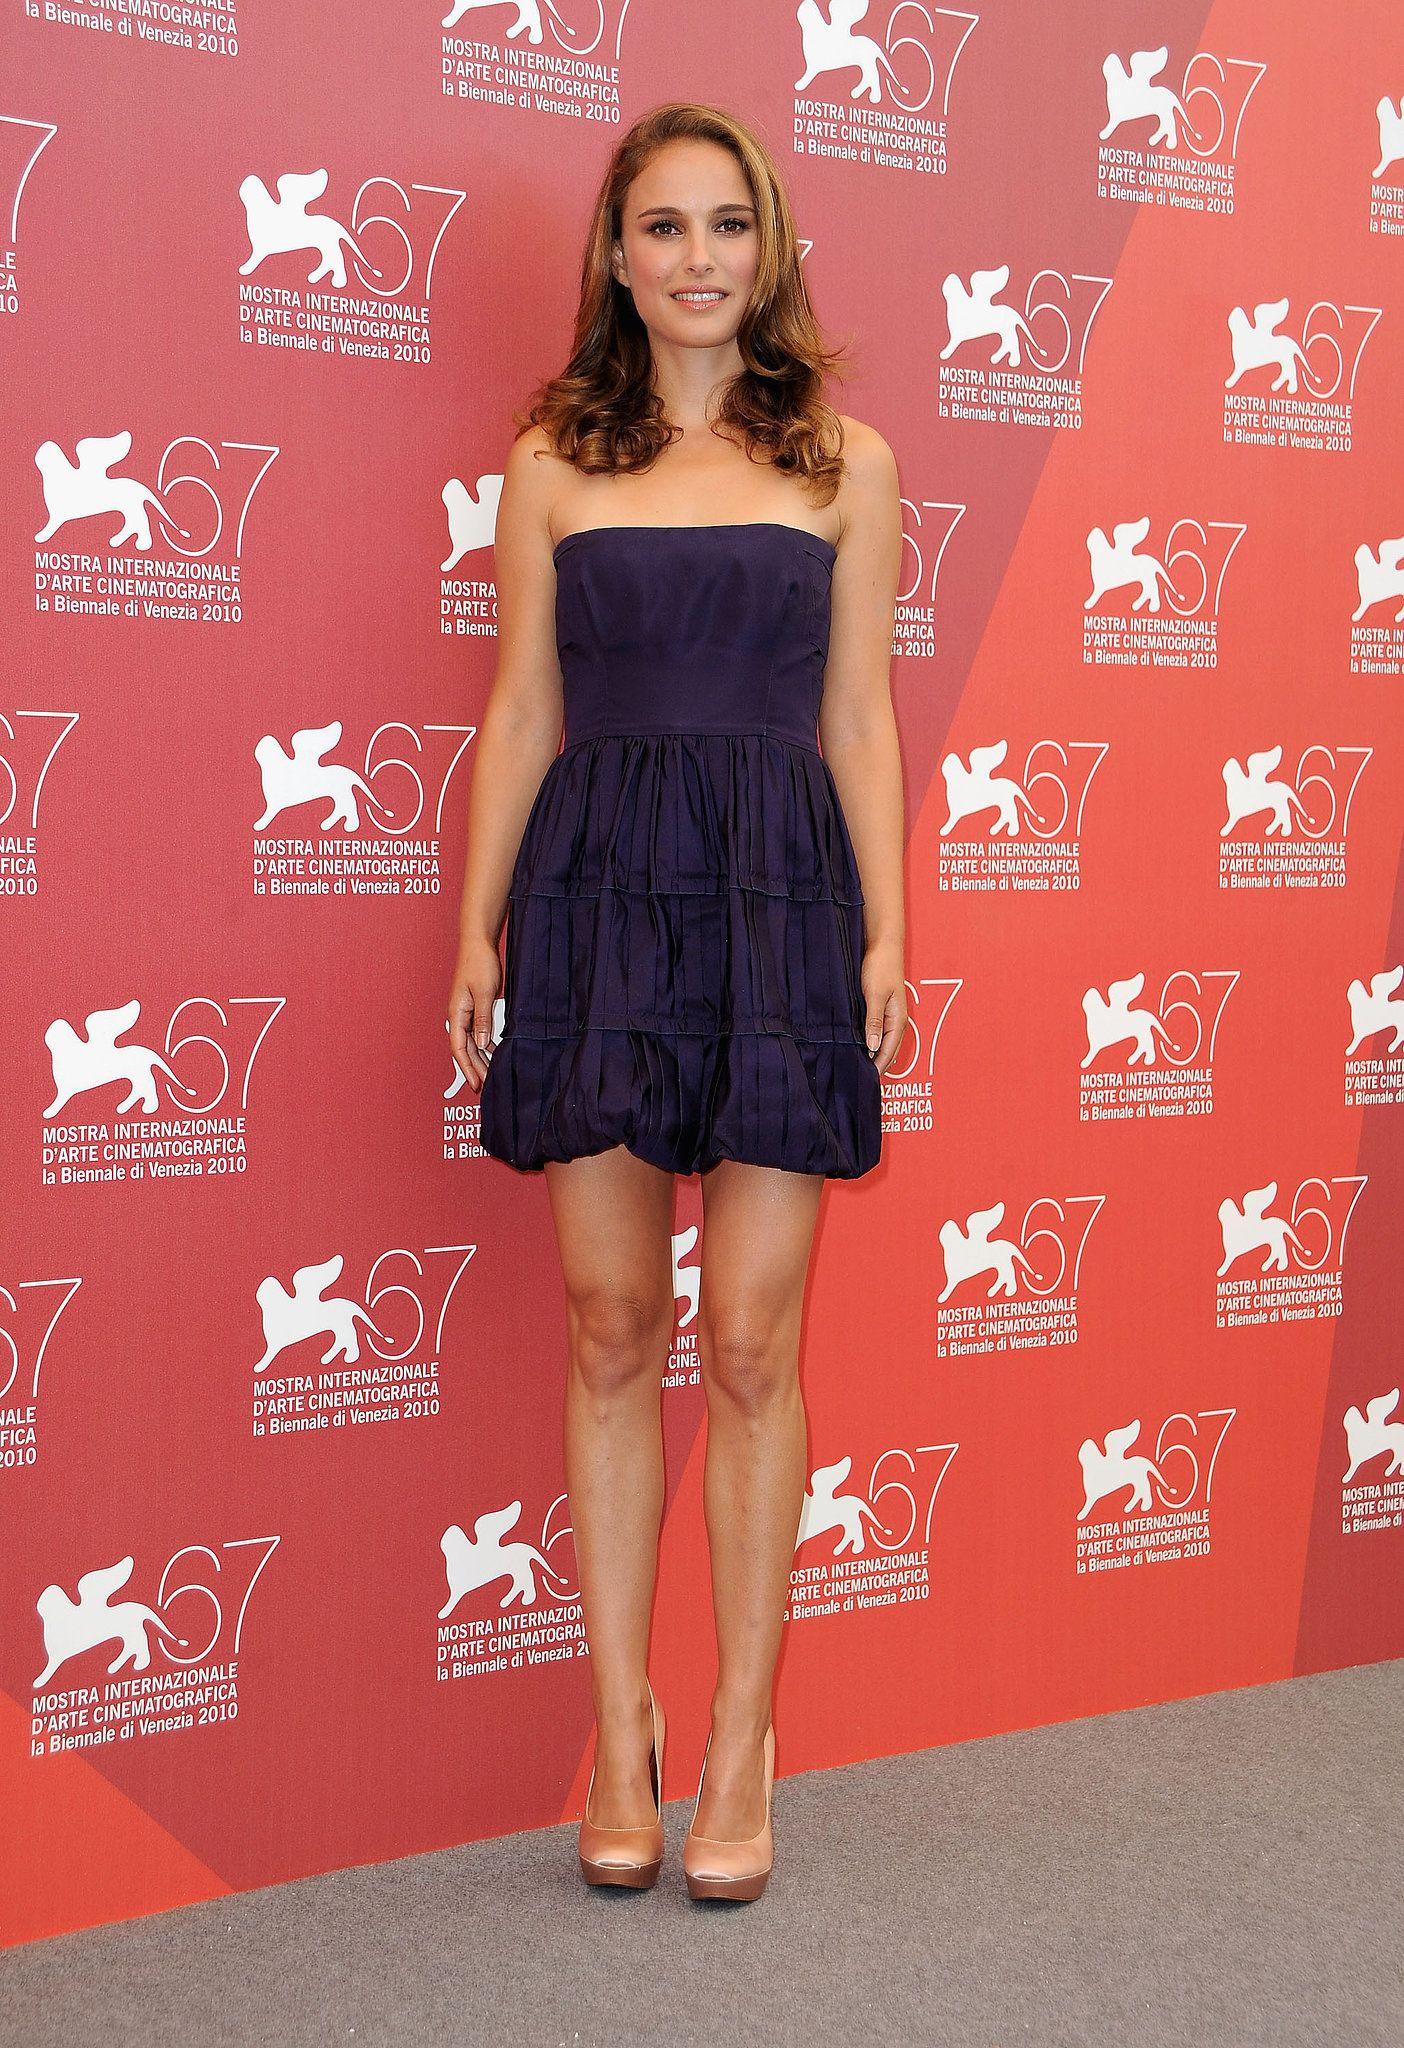 natalie portman in royal purple minidress at the 2011